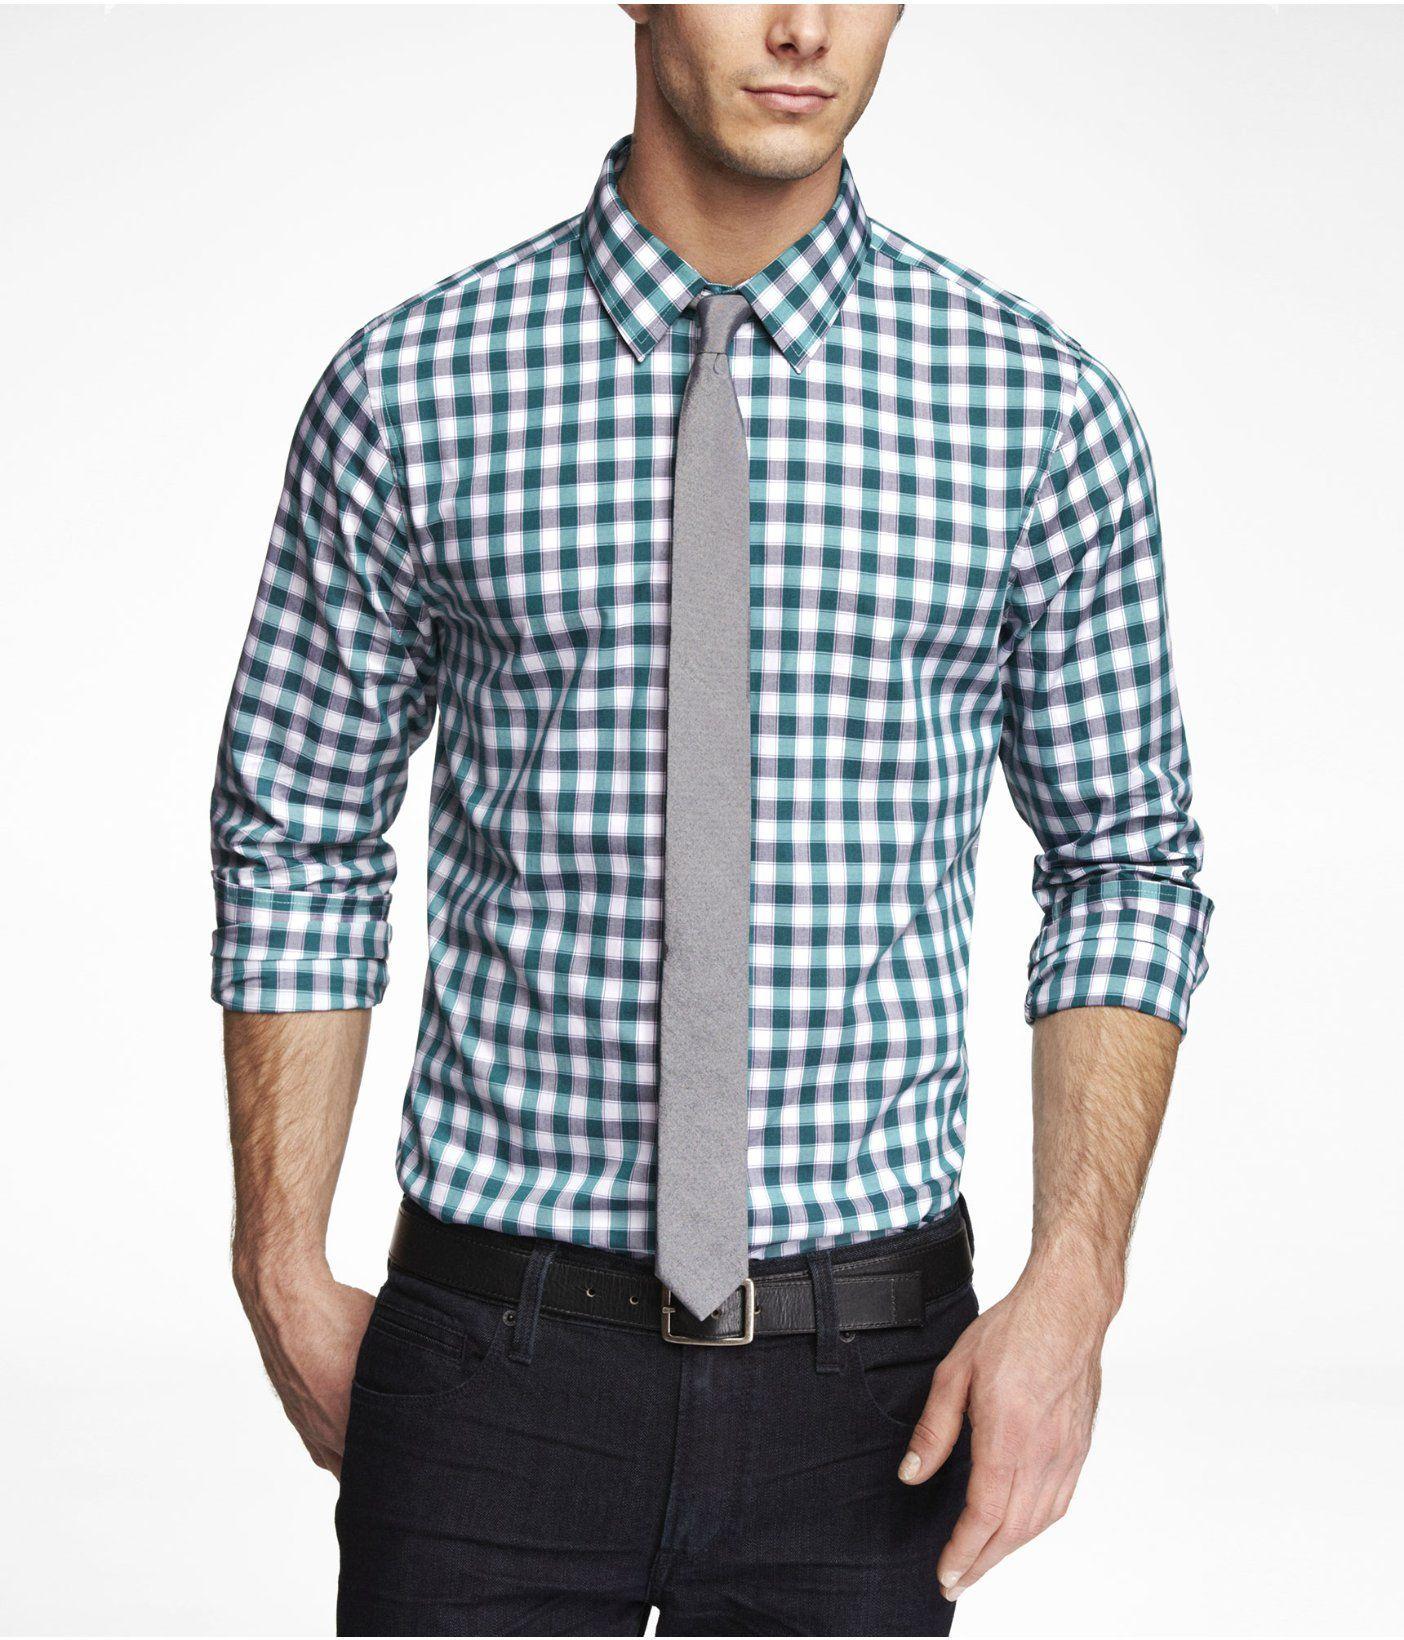 Extra Slim Plaid Dress Shirt Express Button Down Shirts Mens